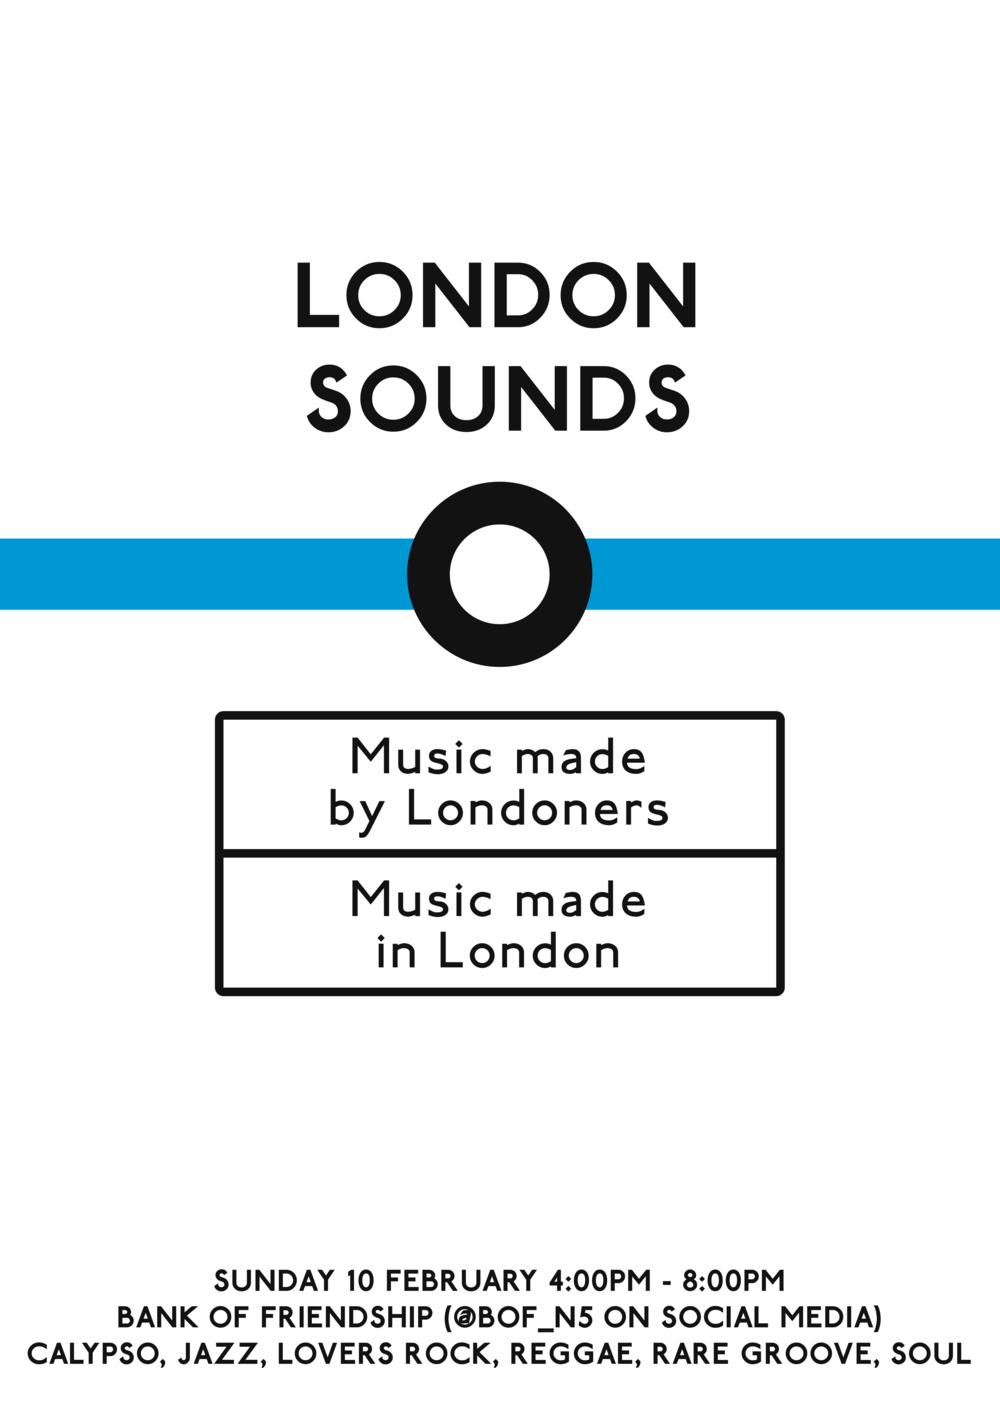 london-sounds-bof-feb-19.png